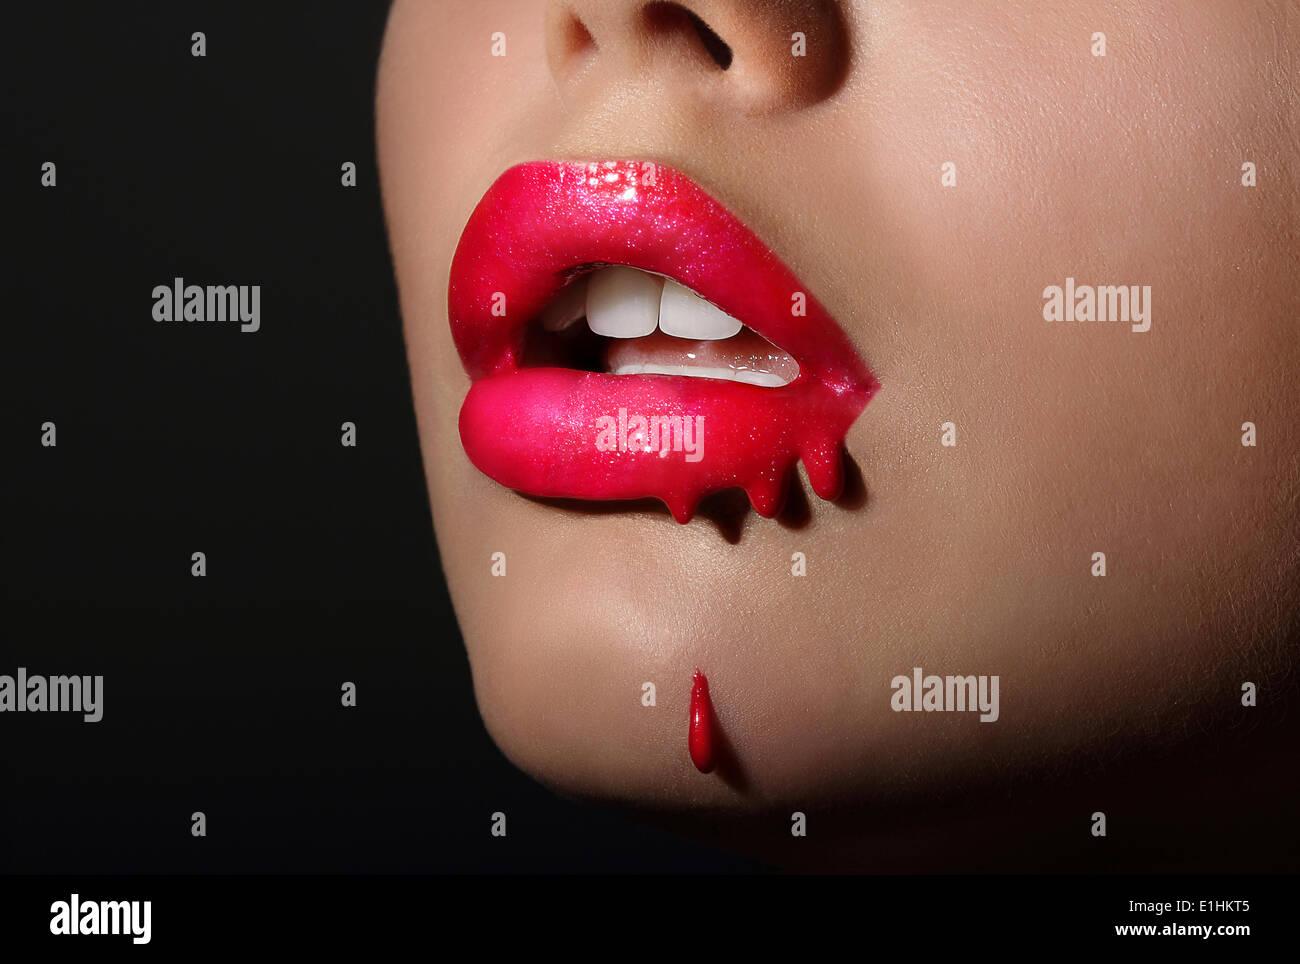 Splash. Frau roten Lippen mit Lippenstift tropft. Kreativität Stockbild